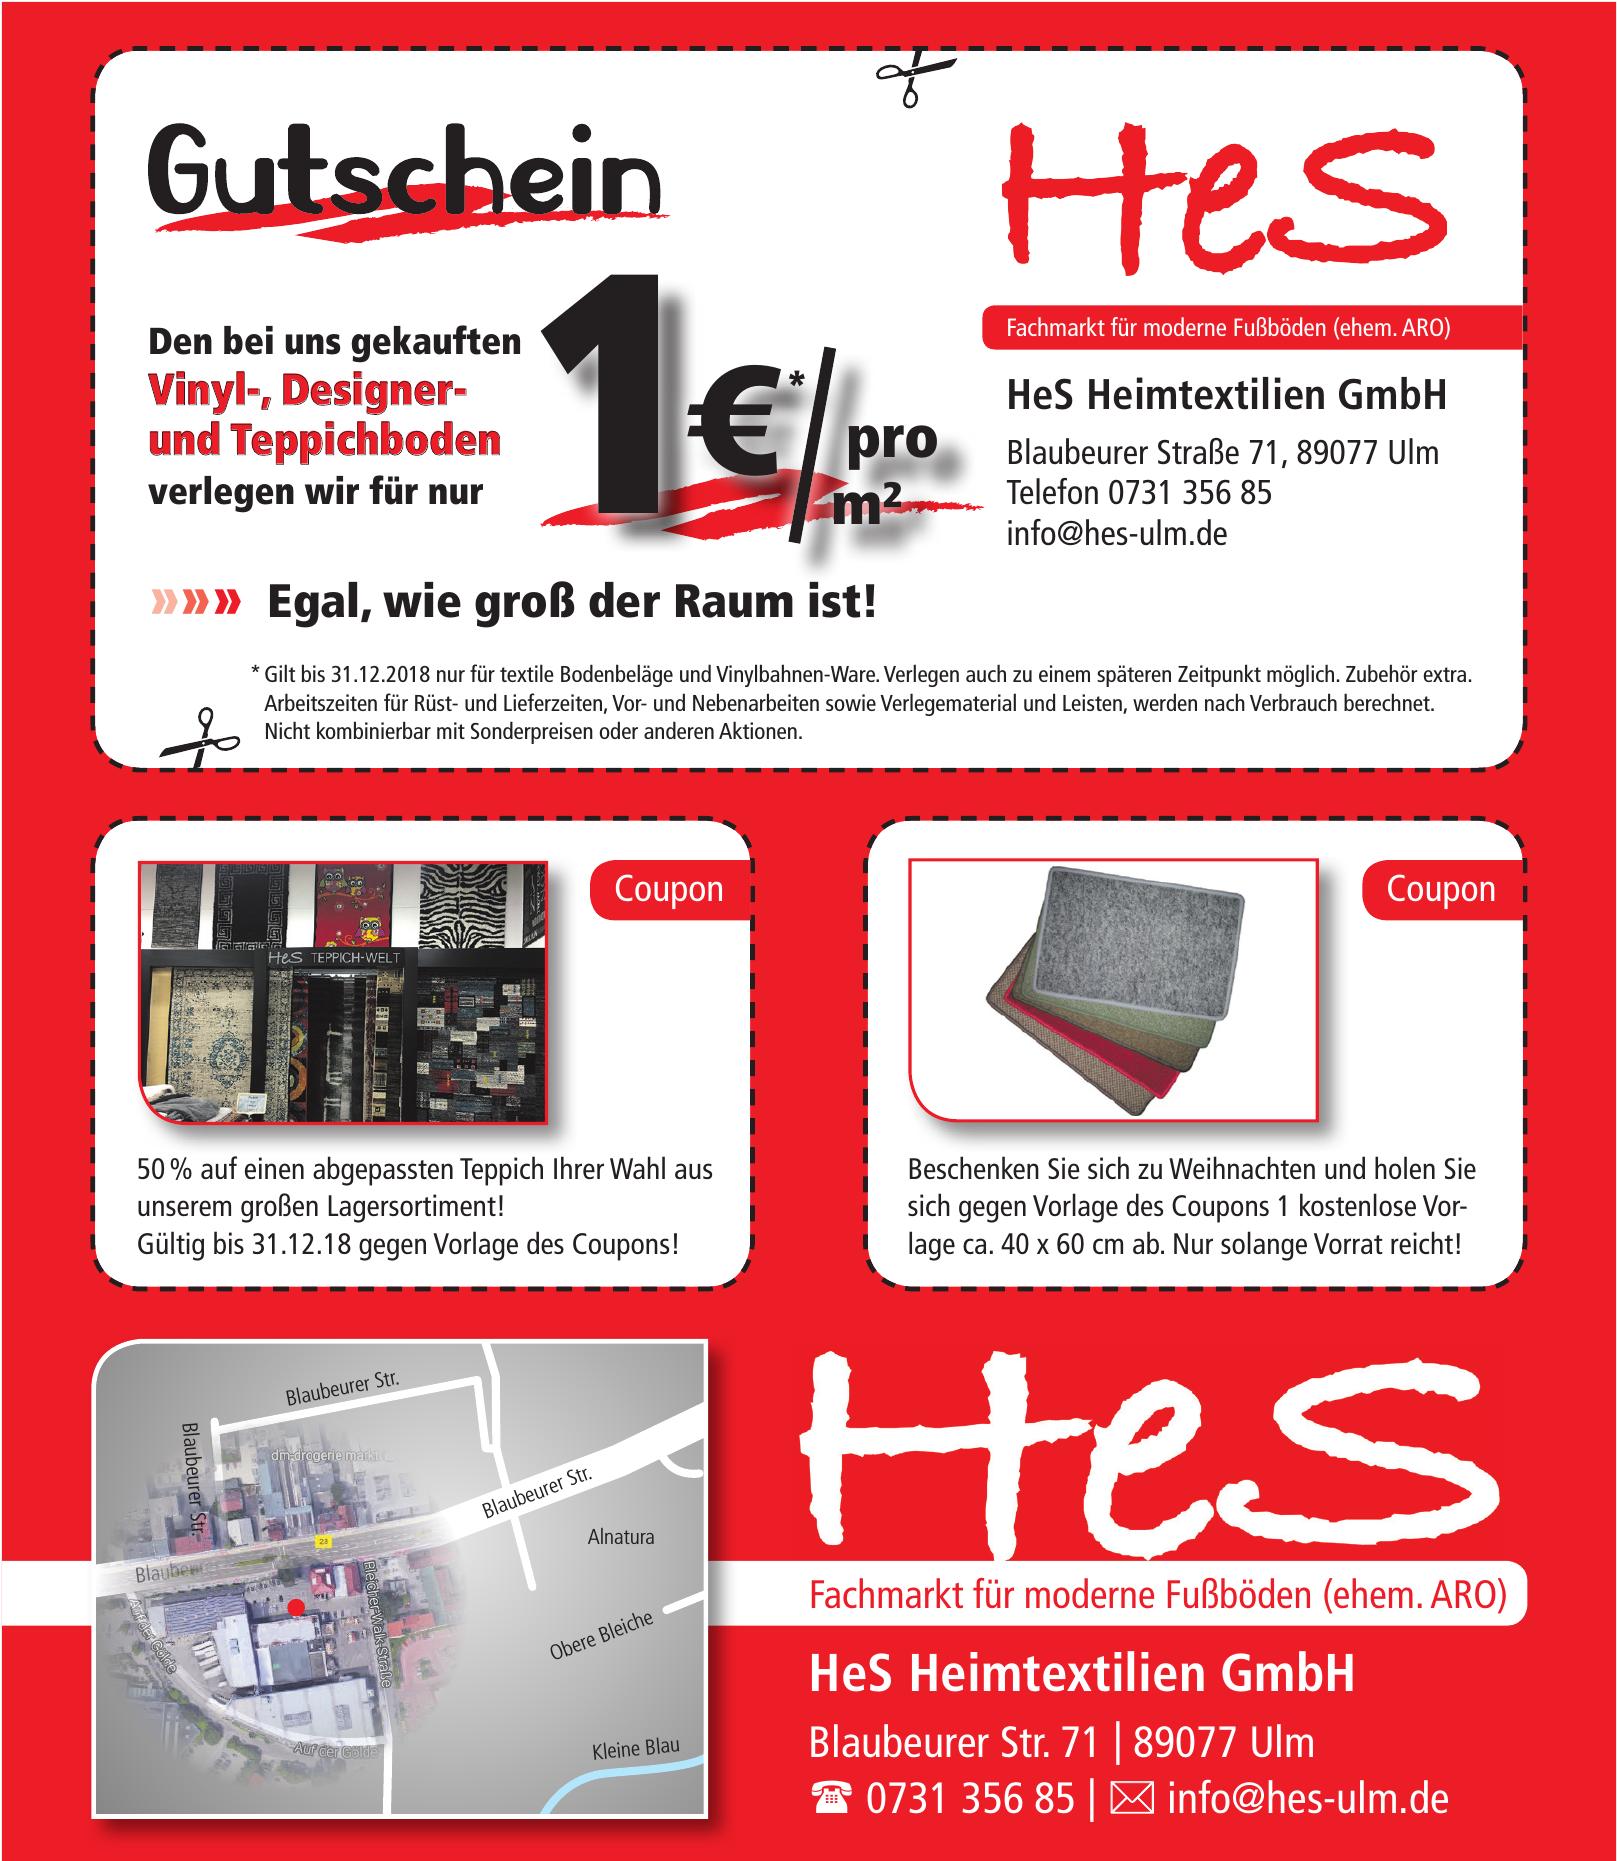 HeS Heimtextilien GmbH